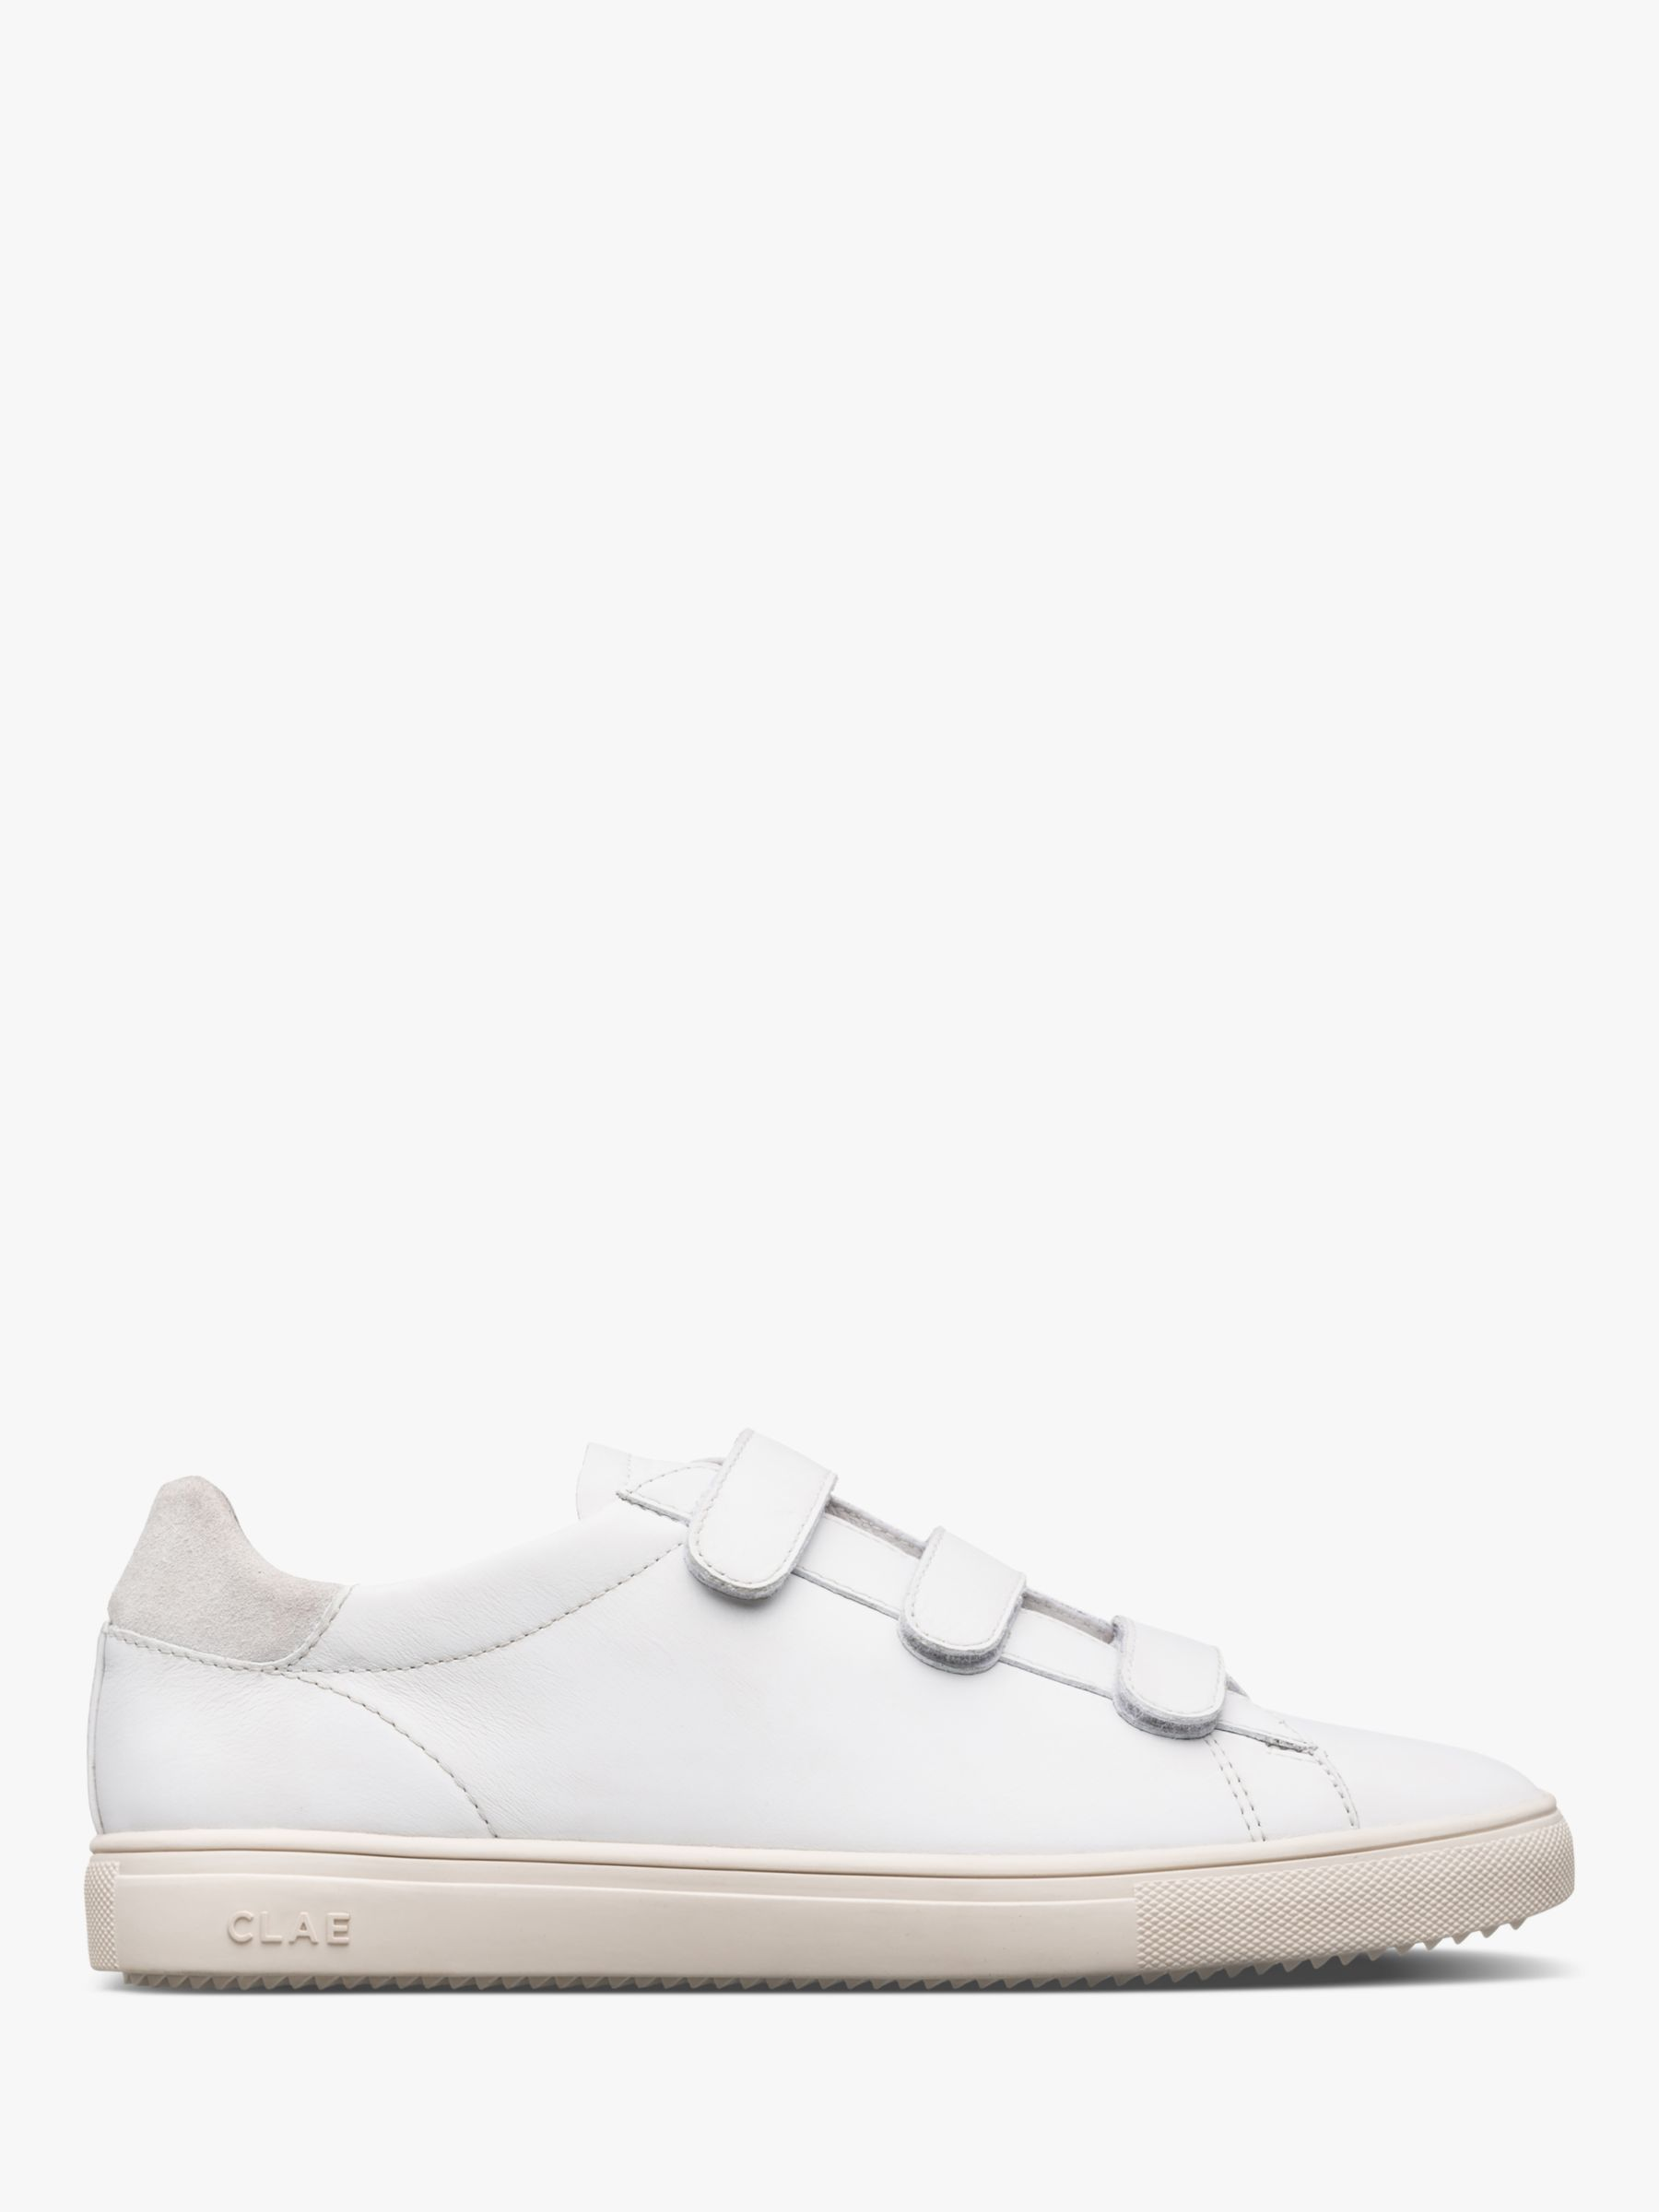 Clae CLAE Bradley Leather Trainers, White